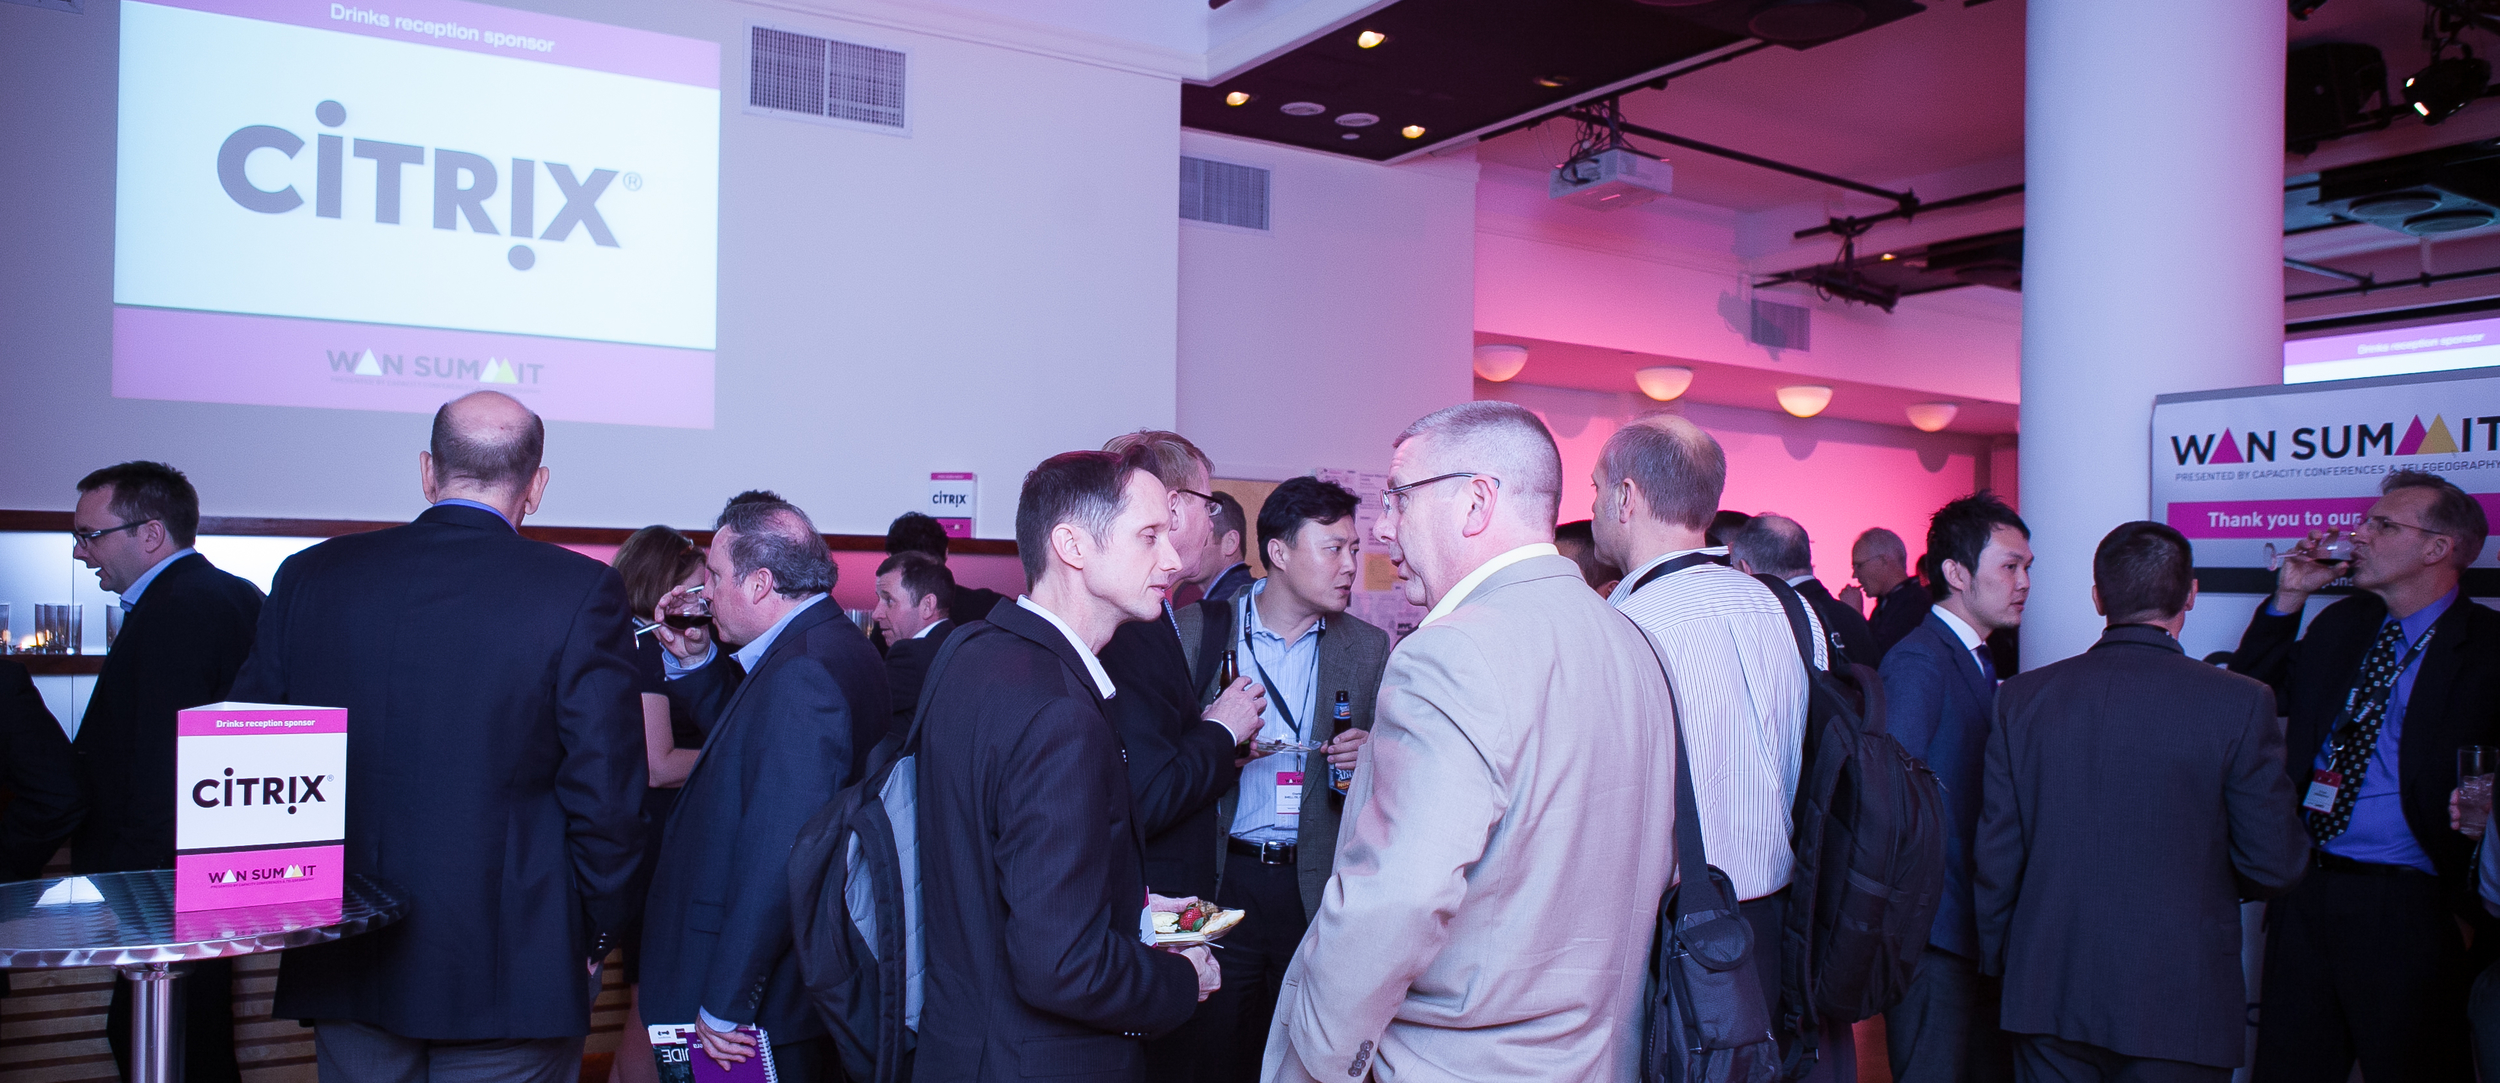 201-Capacity_Conferences-WAN_Summit-042715-IMG_0642.jpg